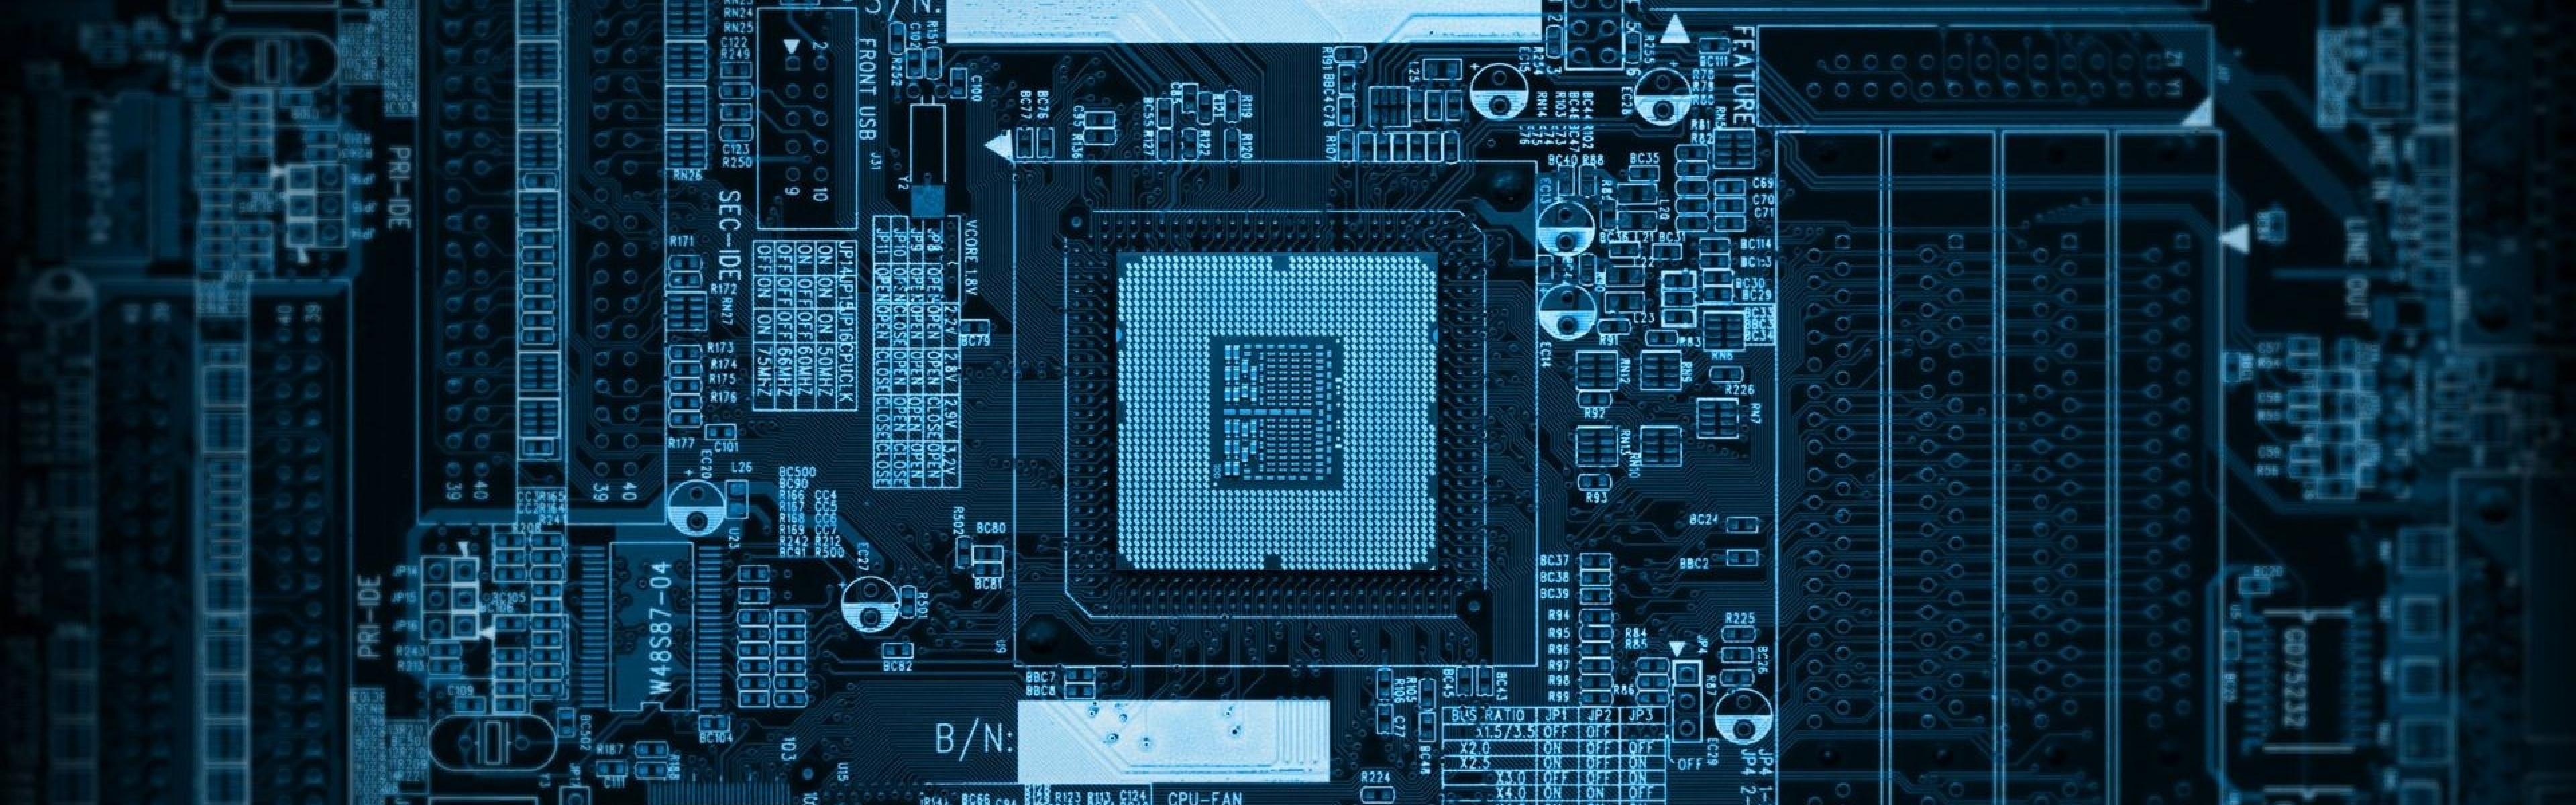 Chip Computer Microchip Processor Wallpaper Background Dual Wide 3840x1200